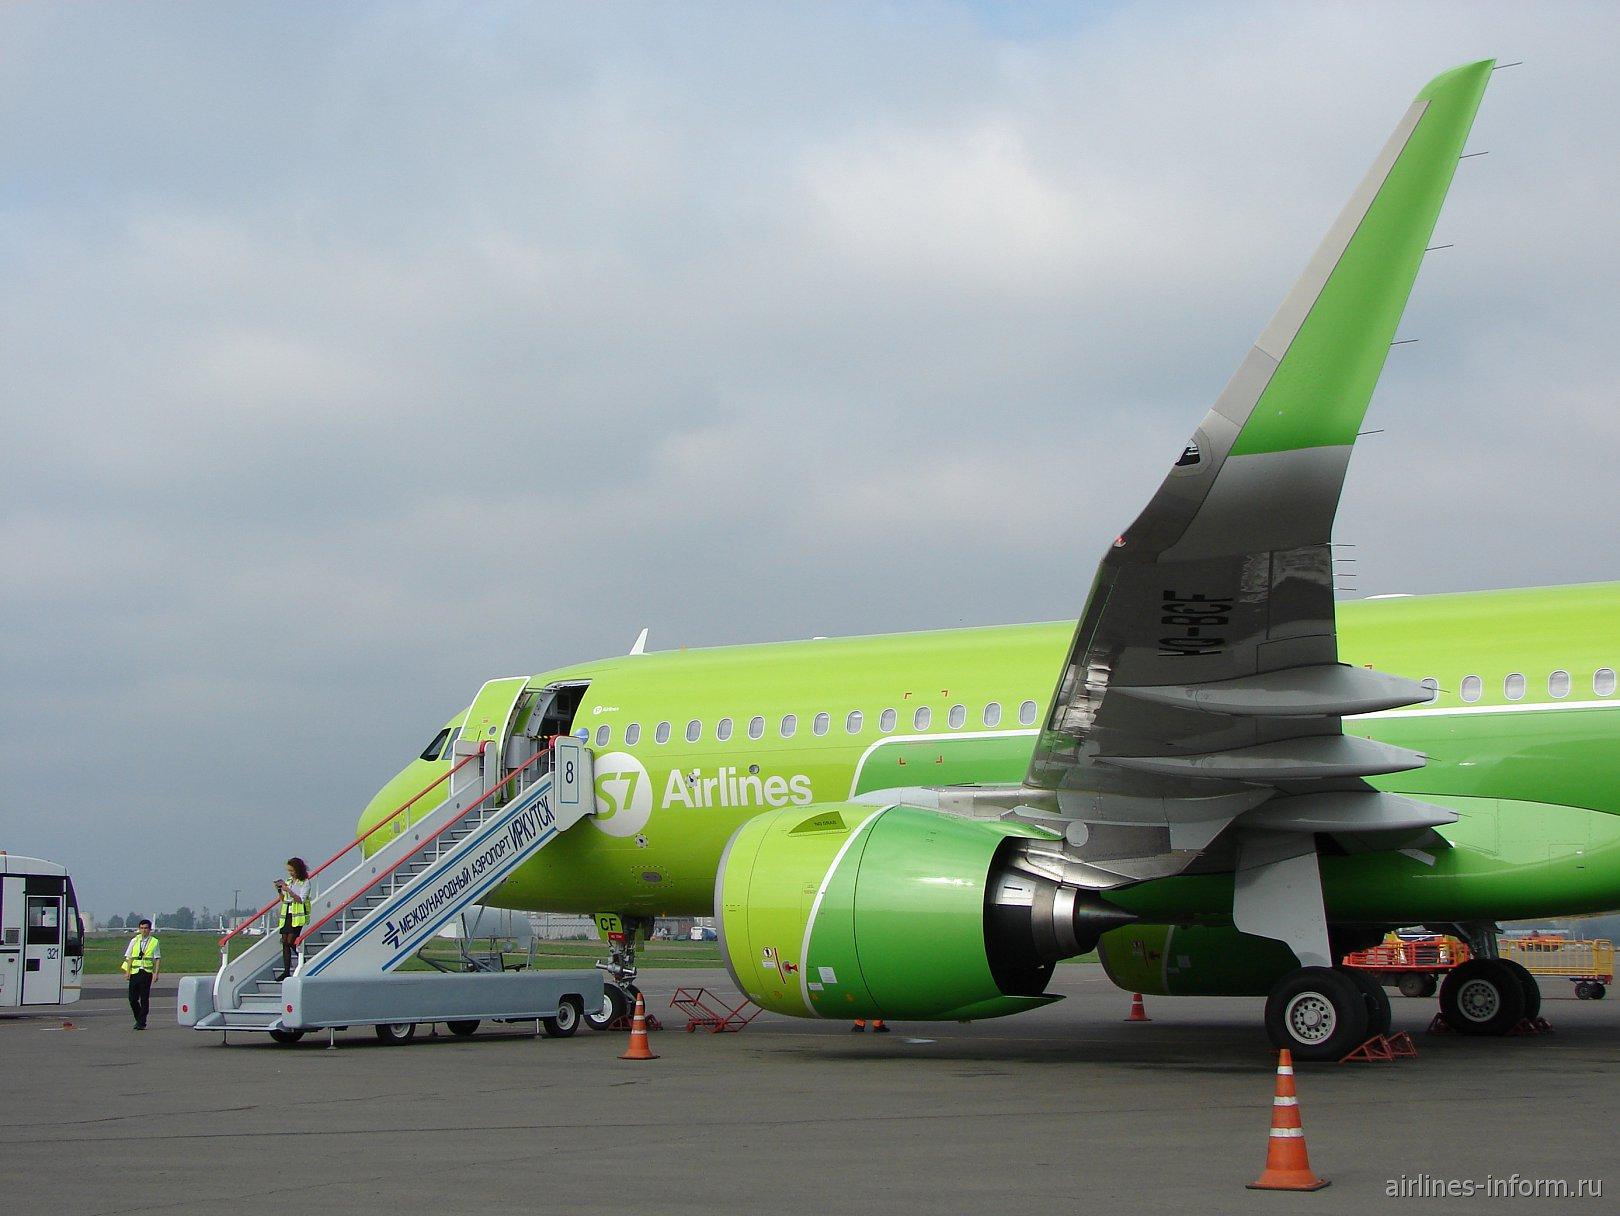 Обслуживание A320neo S7 Airlines в аэропорту Иркутска